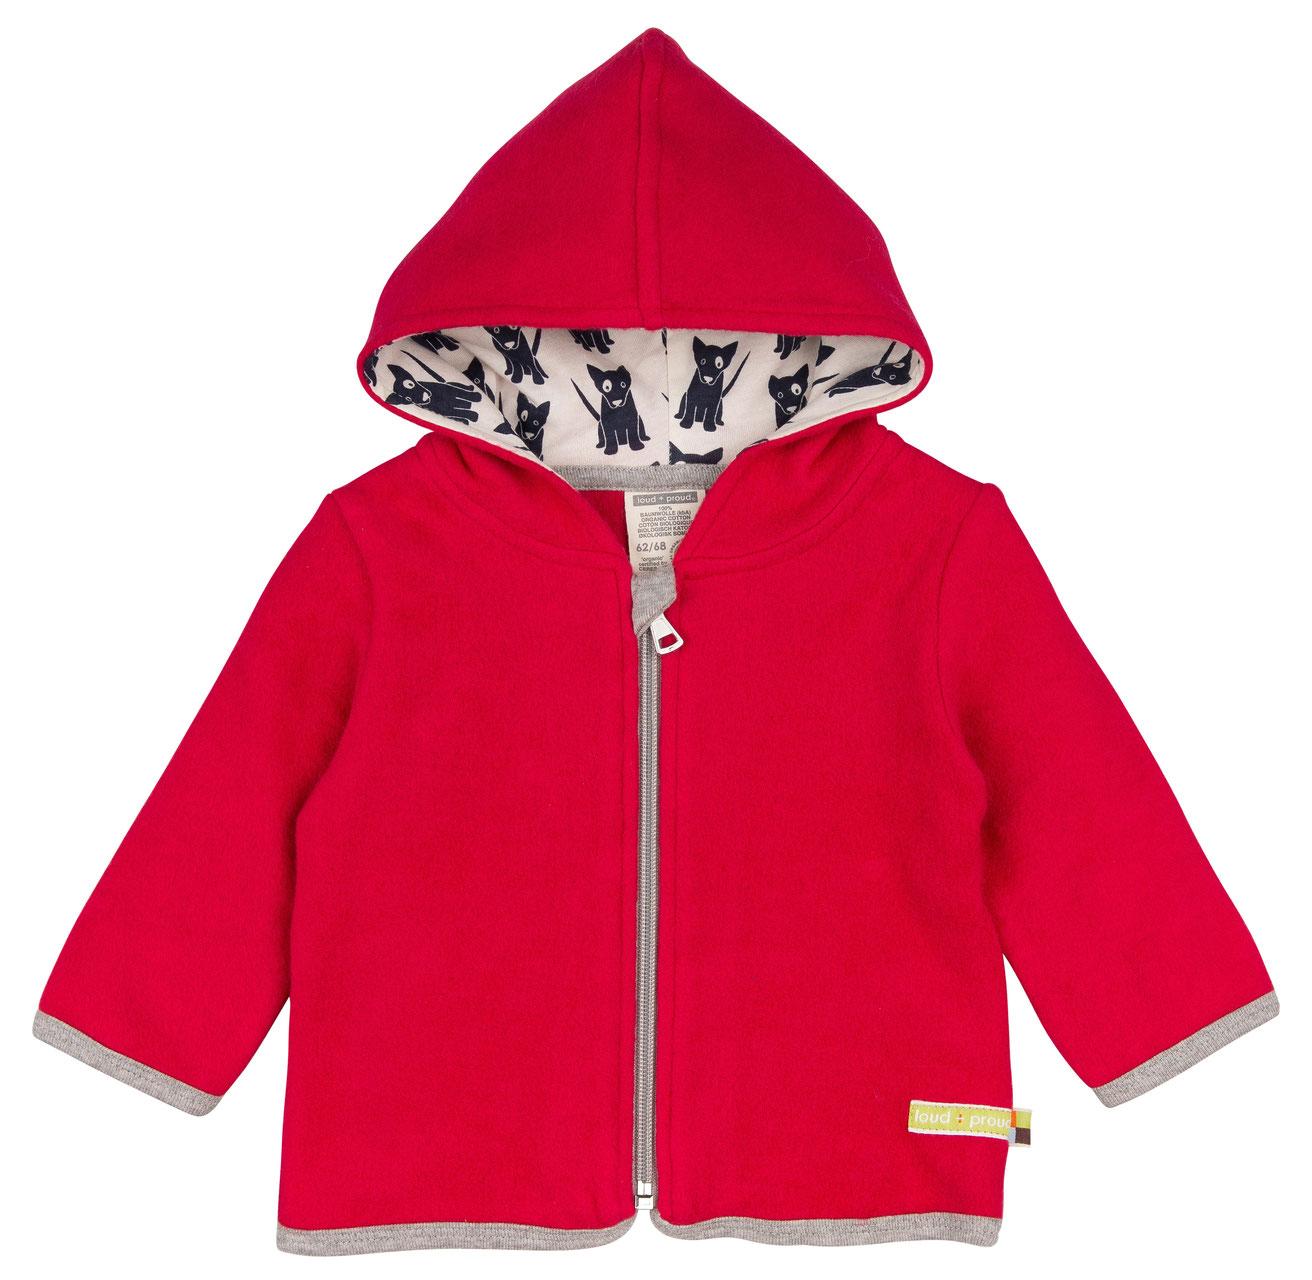 ce53beb384d580 Jacke Loud-Proud - Bio Kinderkleidung - Alle Artikel stark Reduziert ...